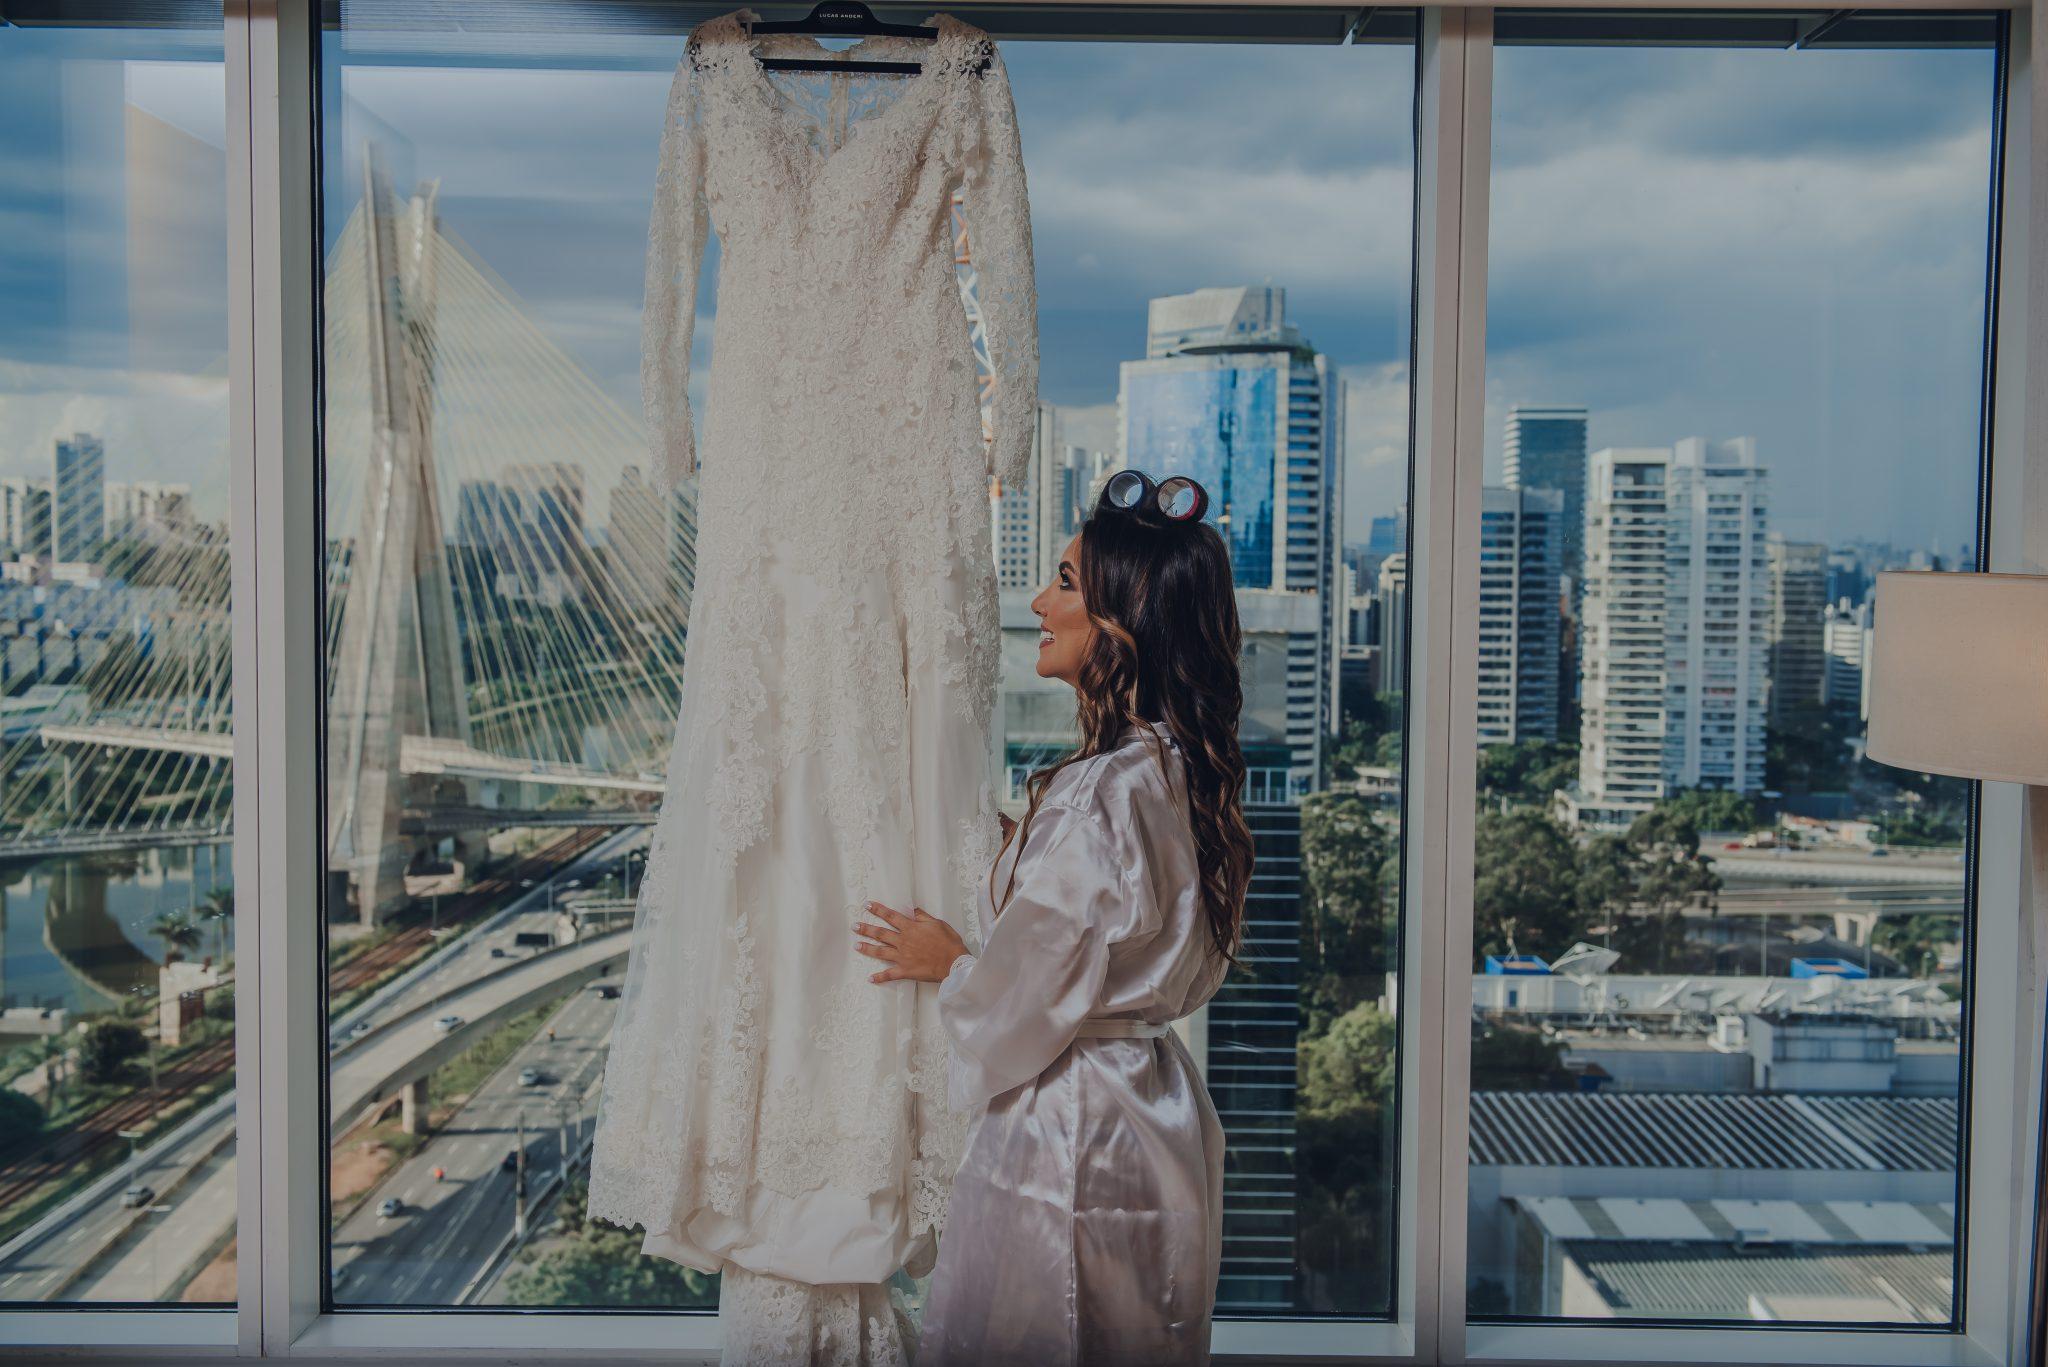 Vestido de noiva: branco ou off white?